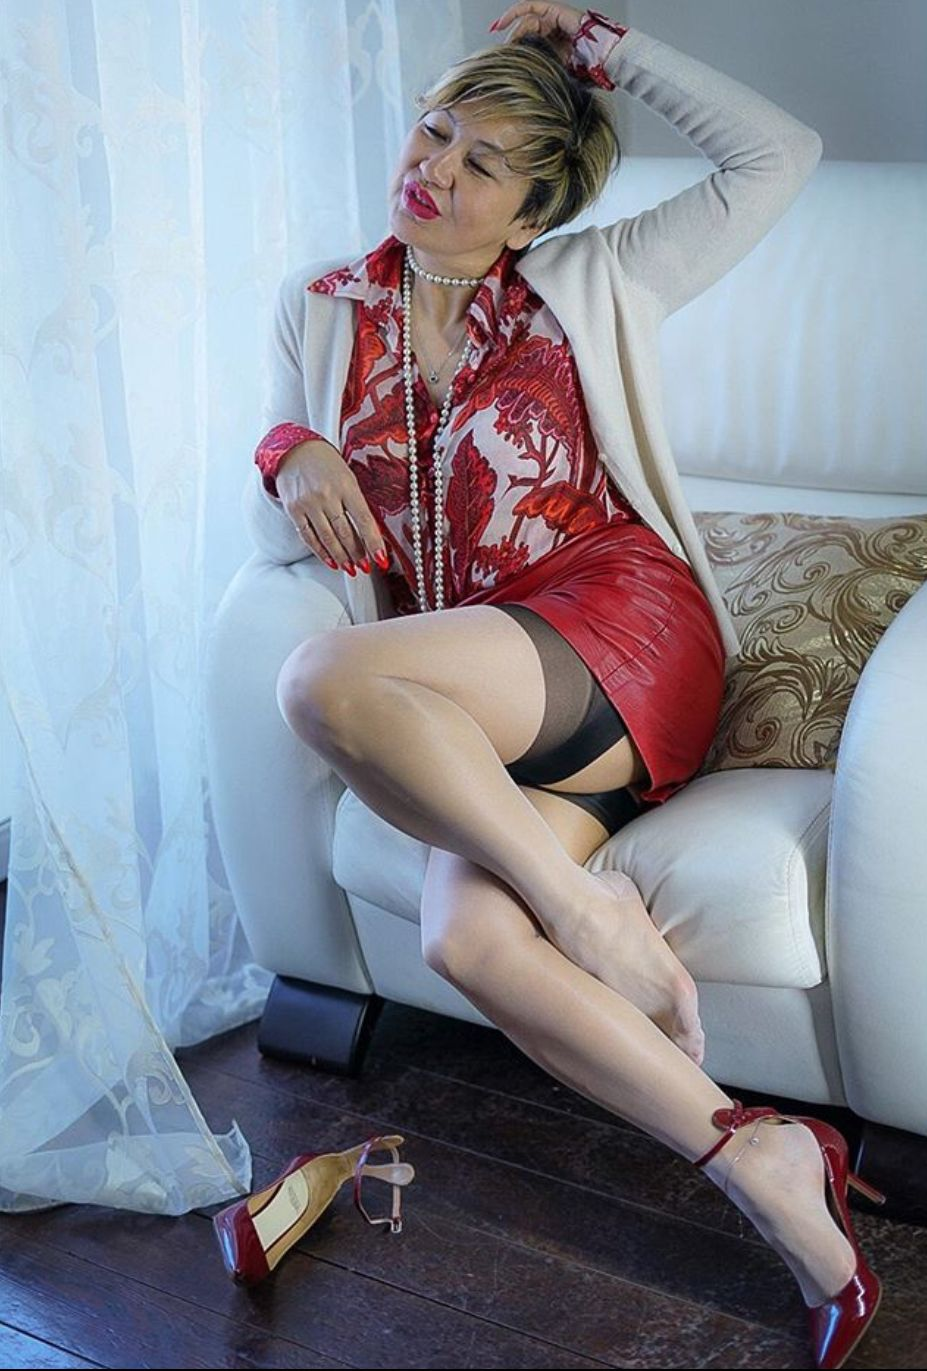 Skinny - Mature Ladies Pics